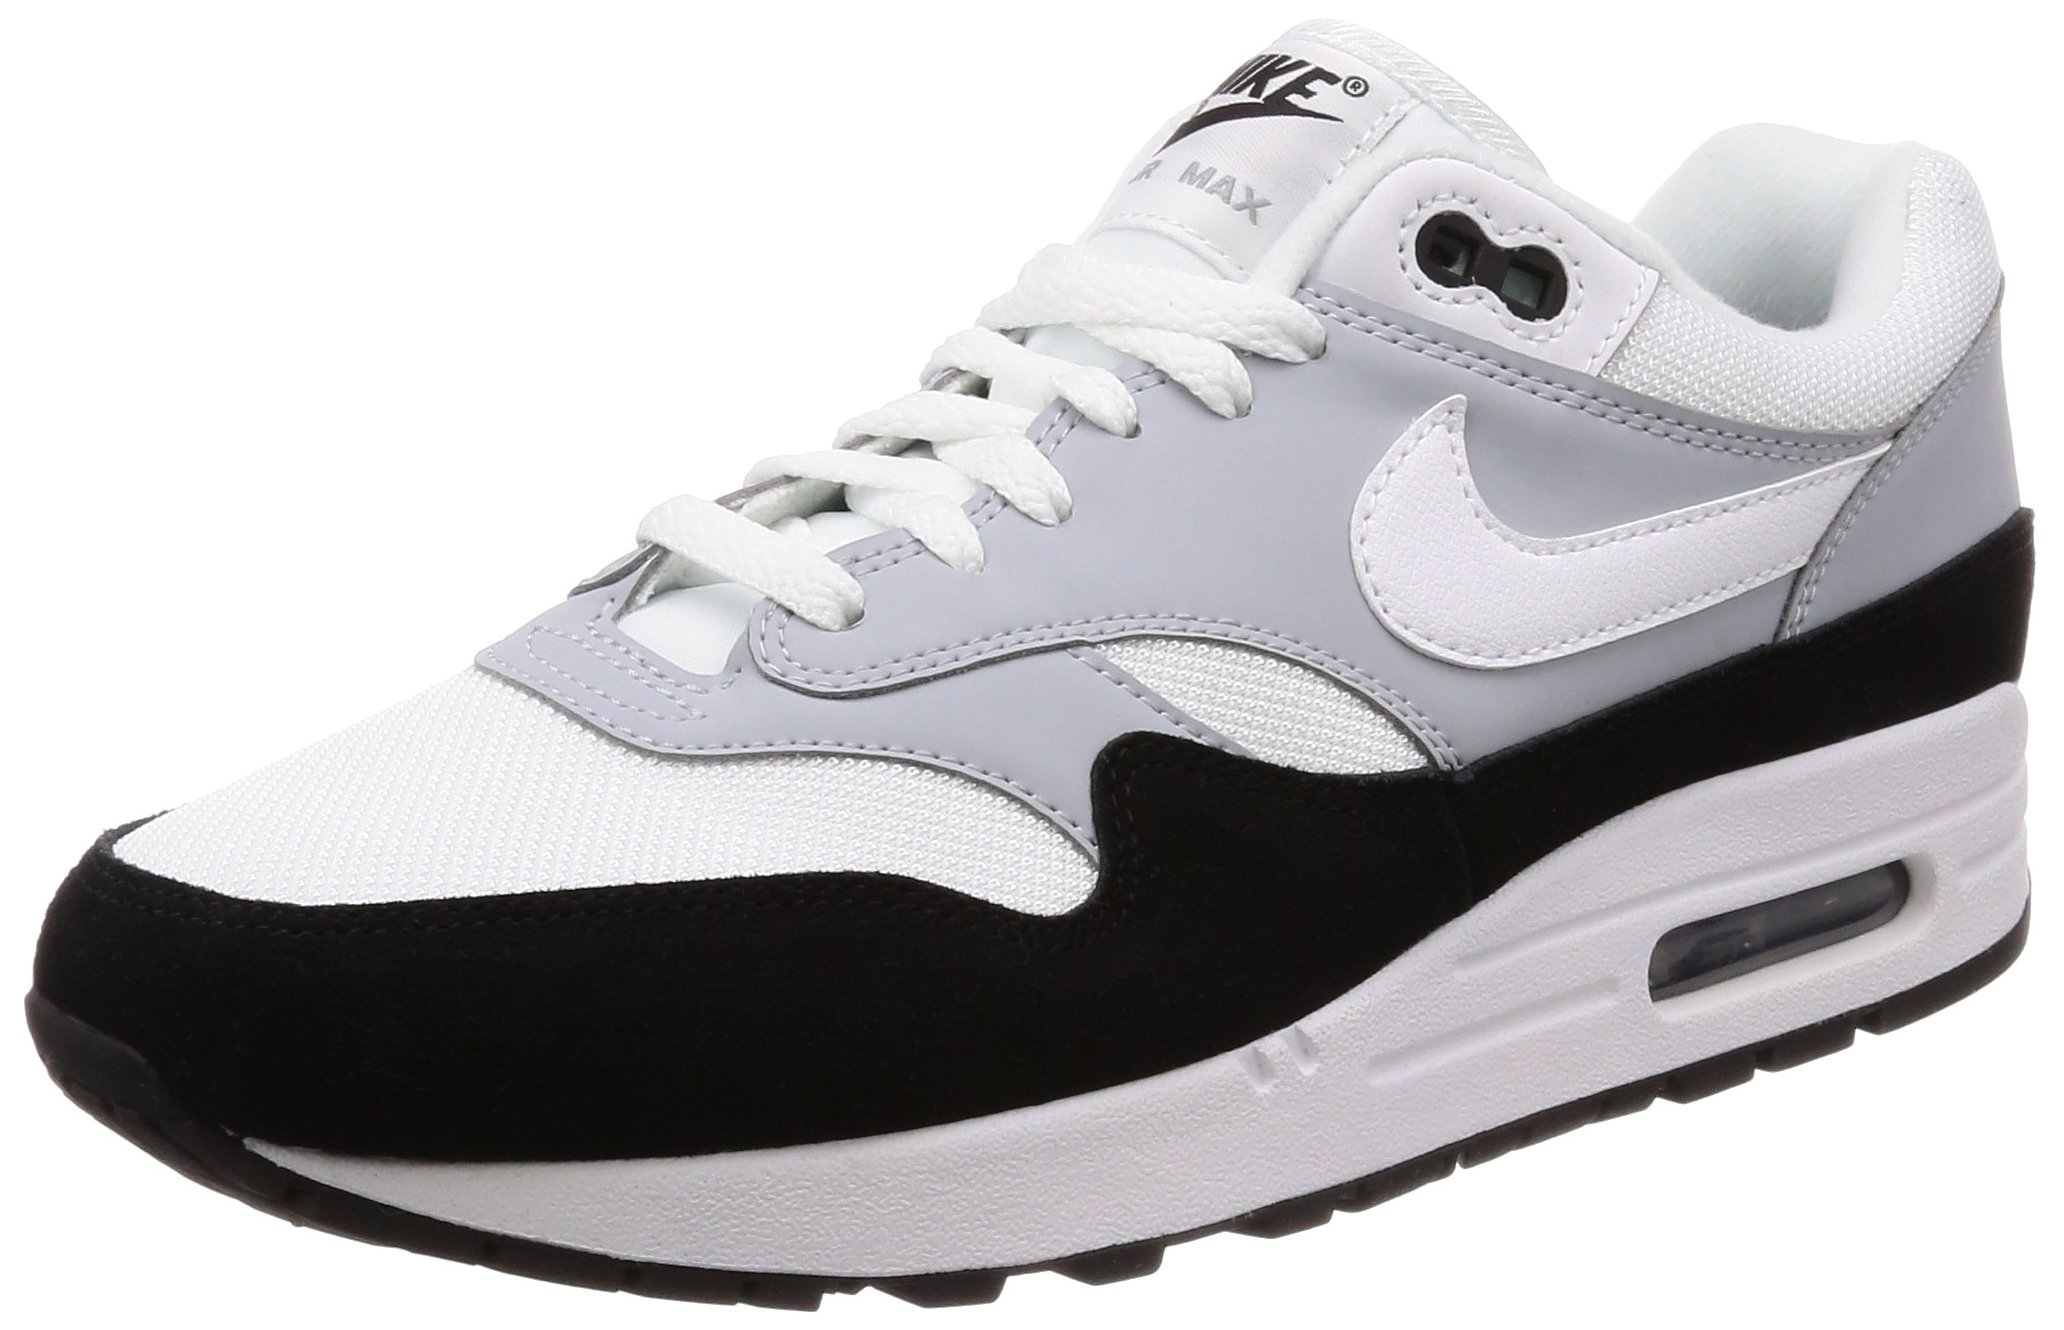 Nike Air Max 1 wolf greyblackwhite (men) (AH8145 003